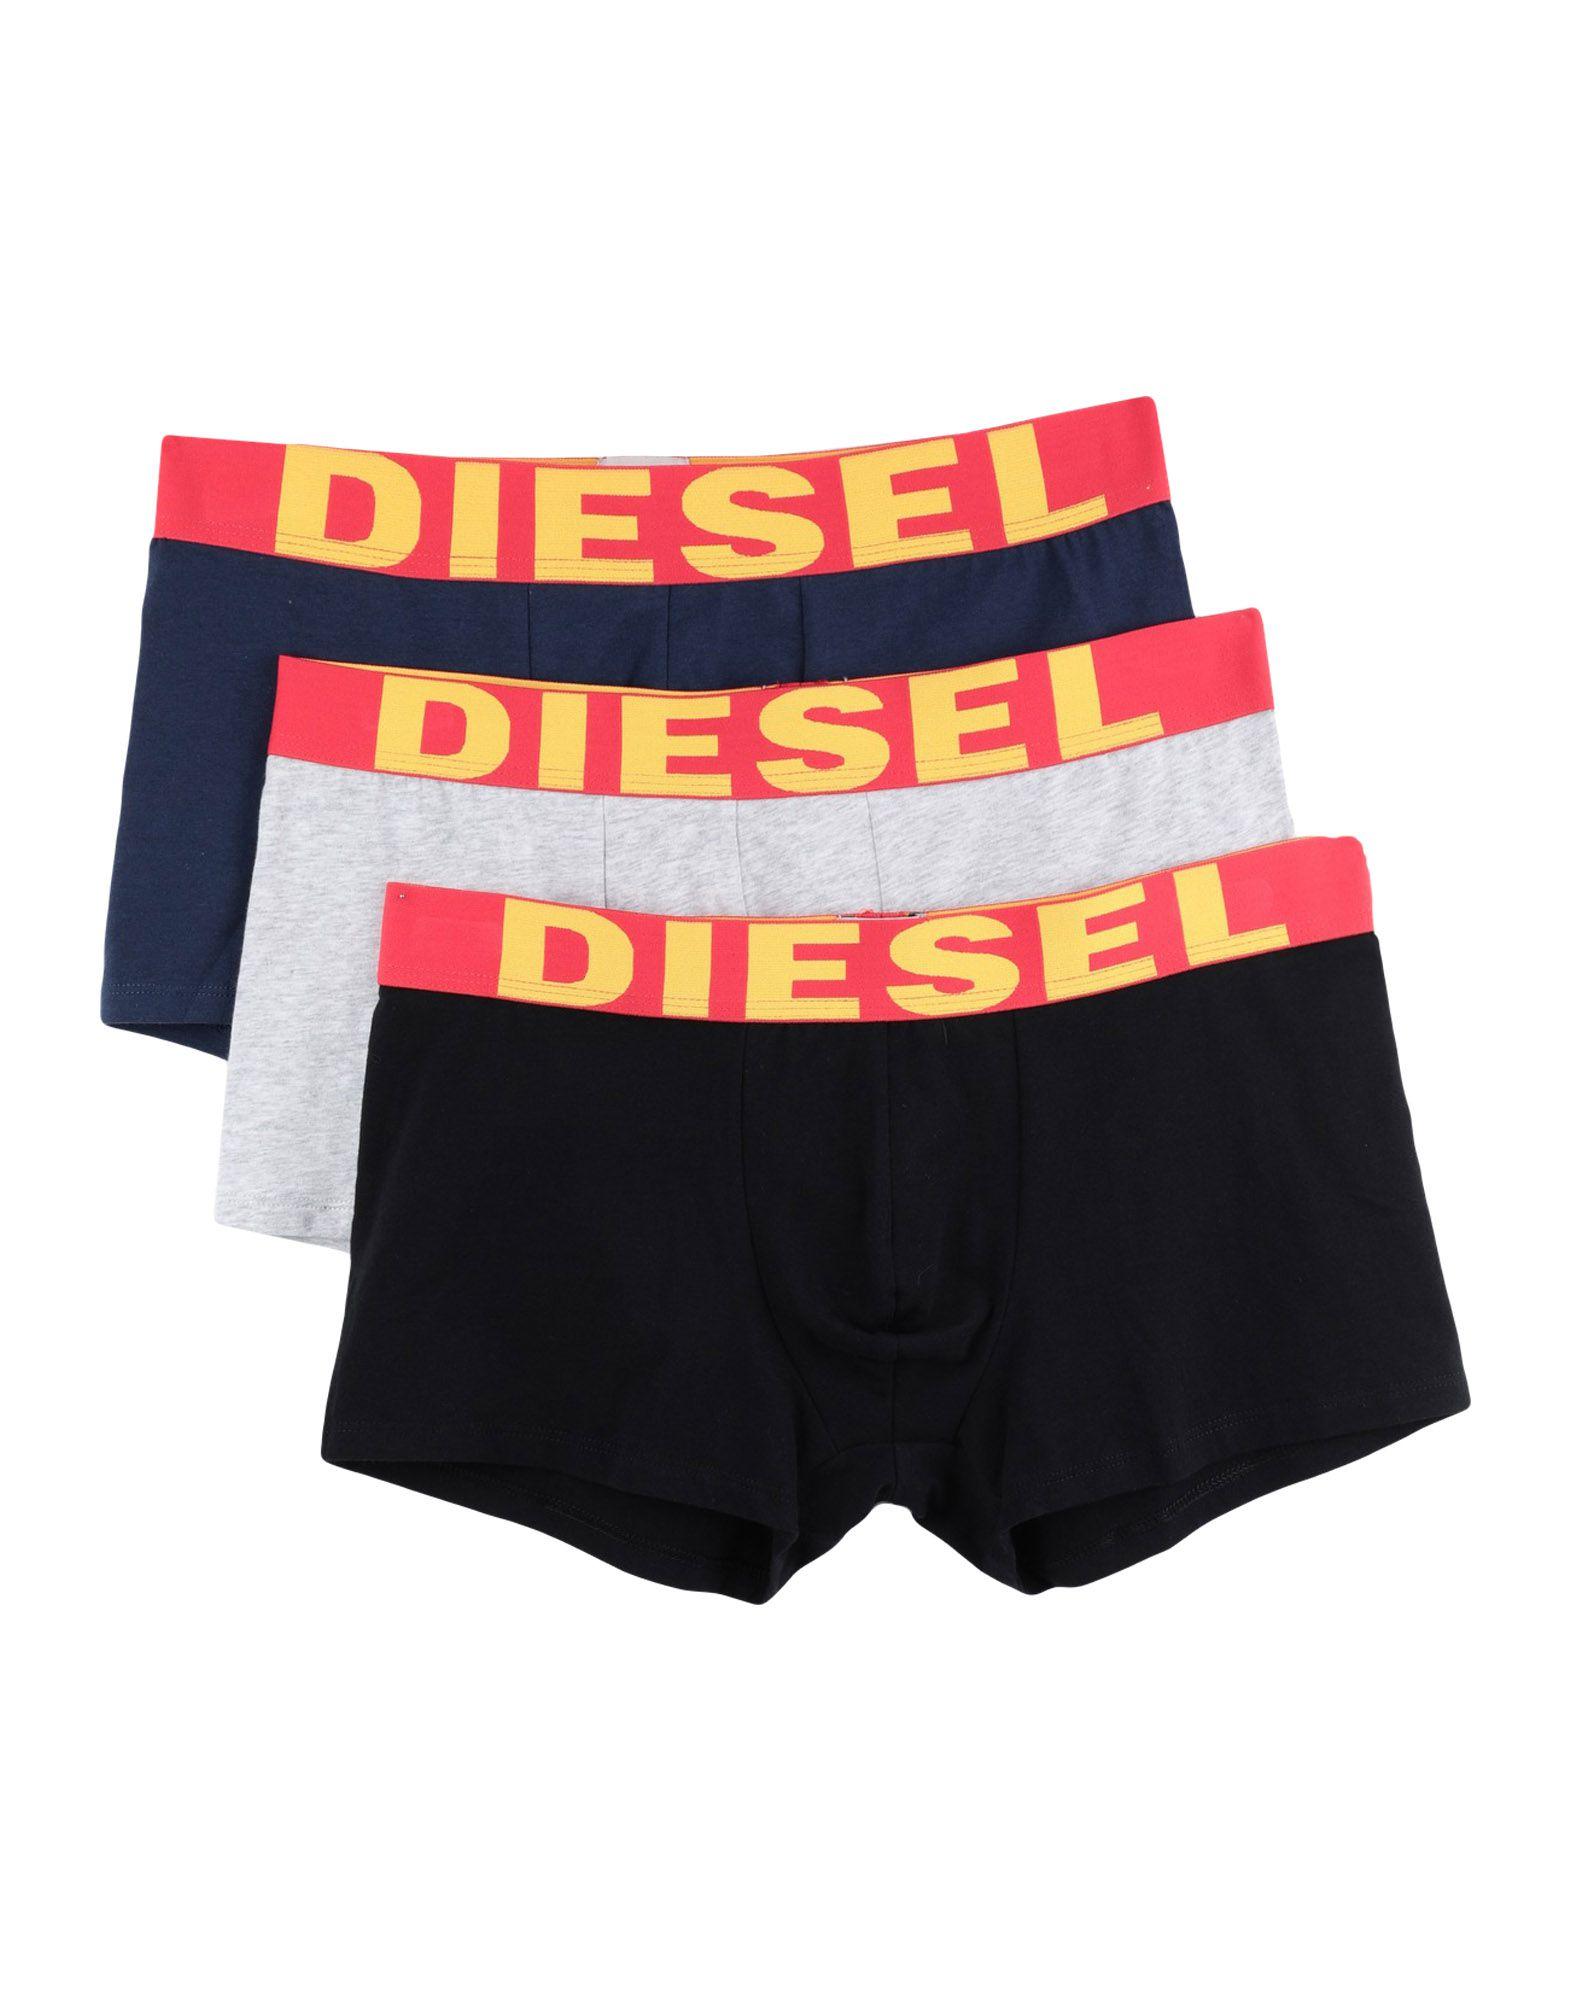 DIESEL Боксеры diesel боксеры